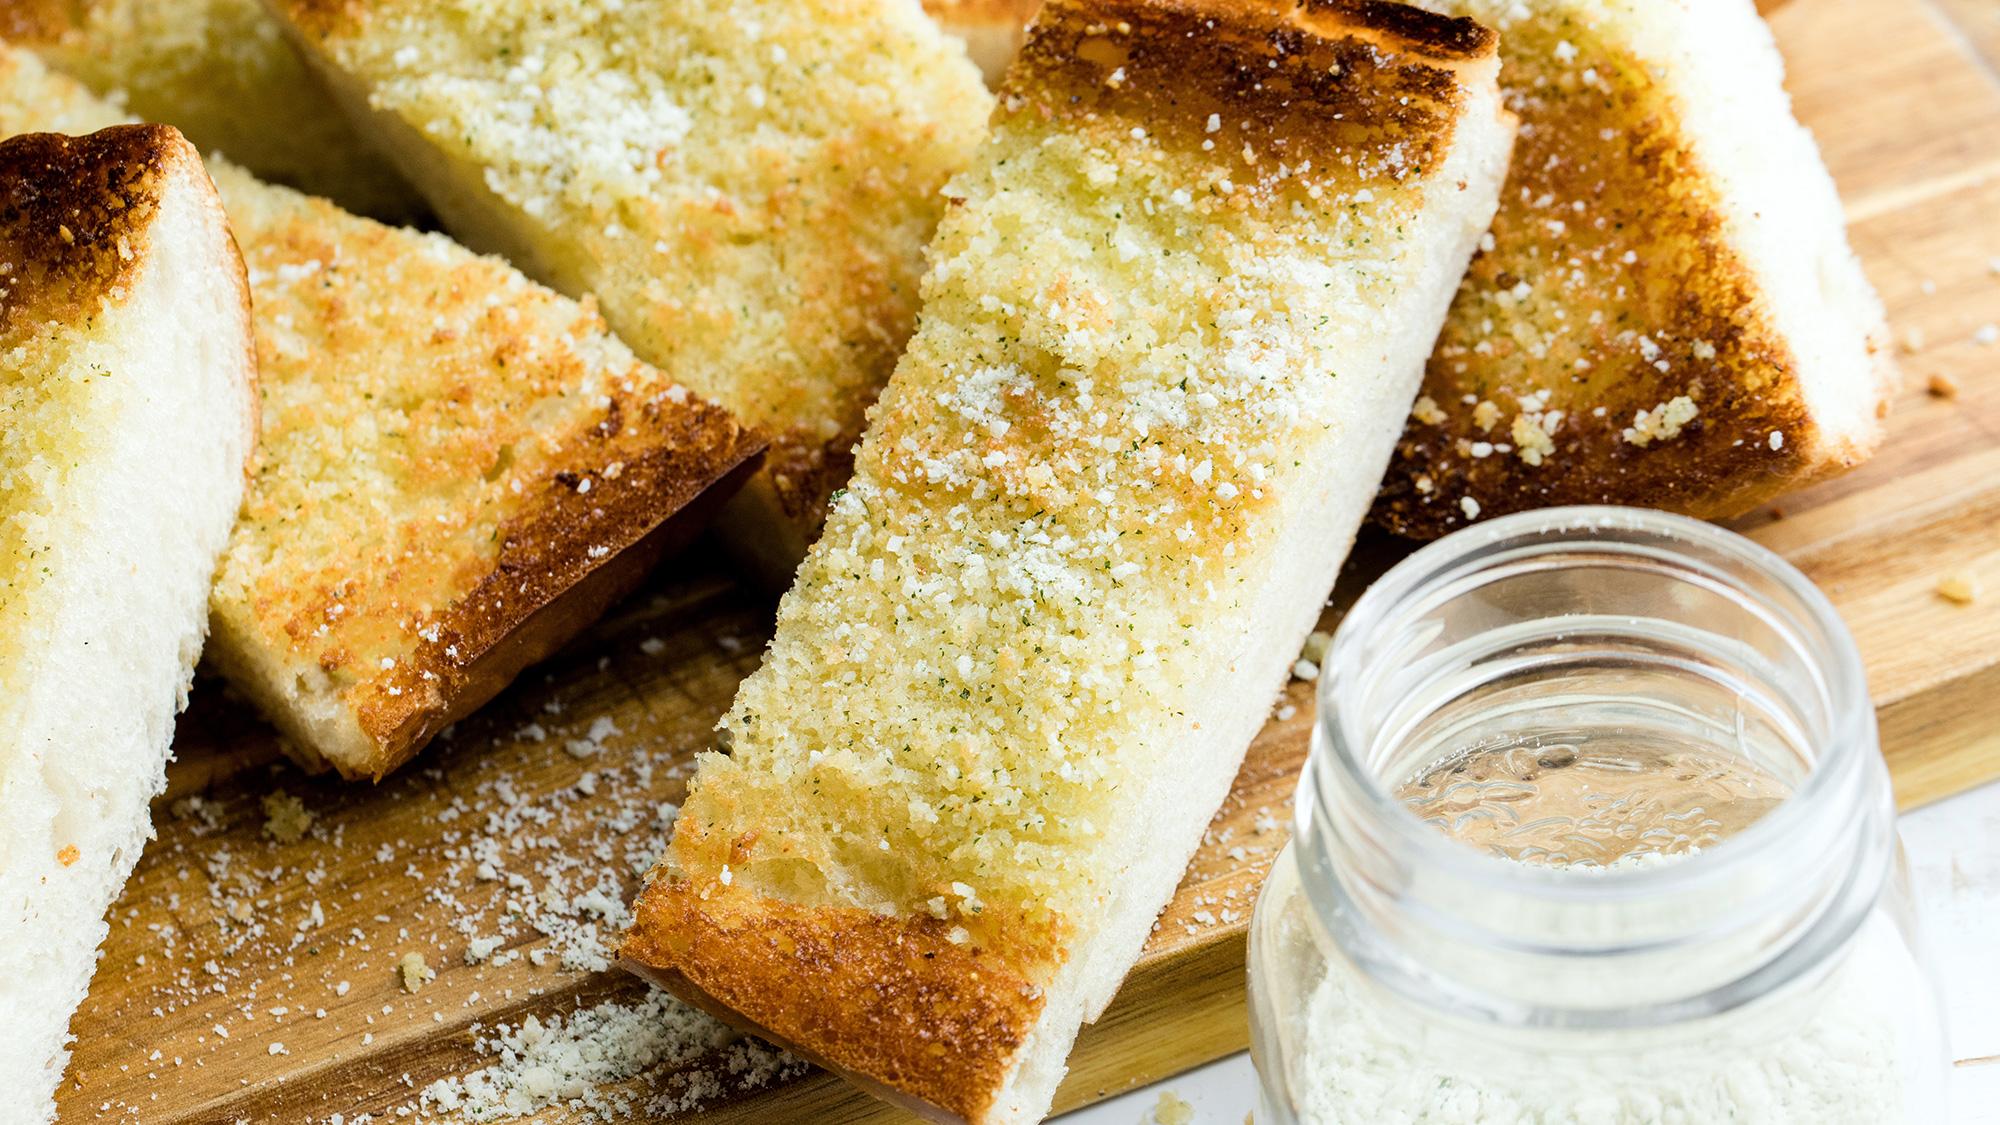 Garlic-Bread-Sprinkle-2000x1125.jpg